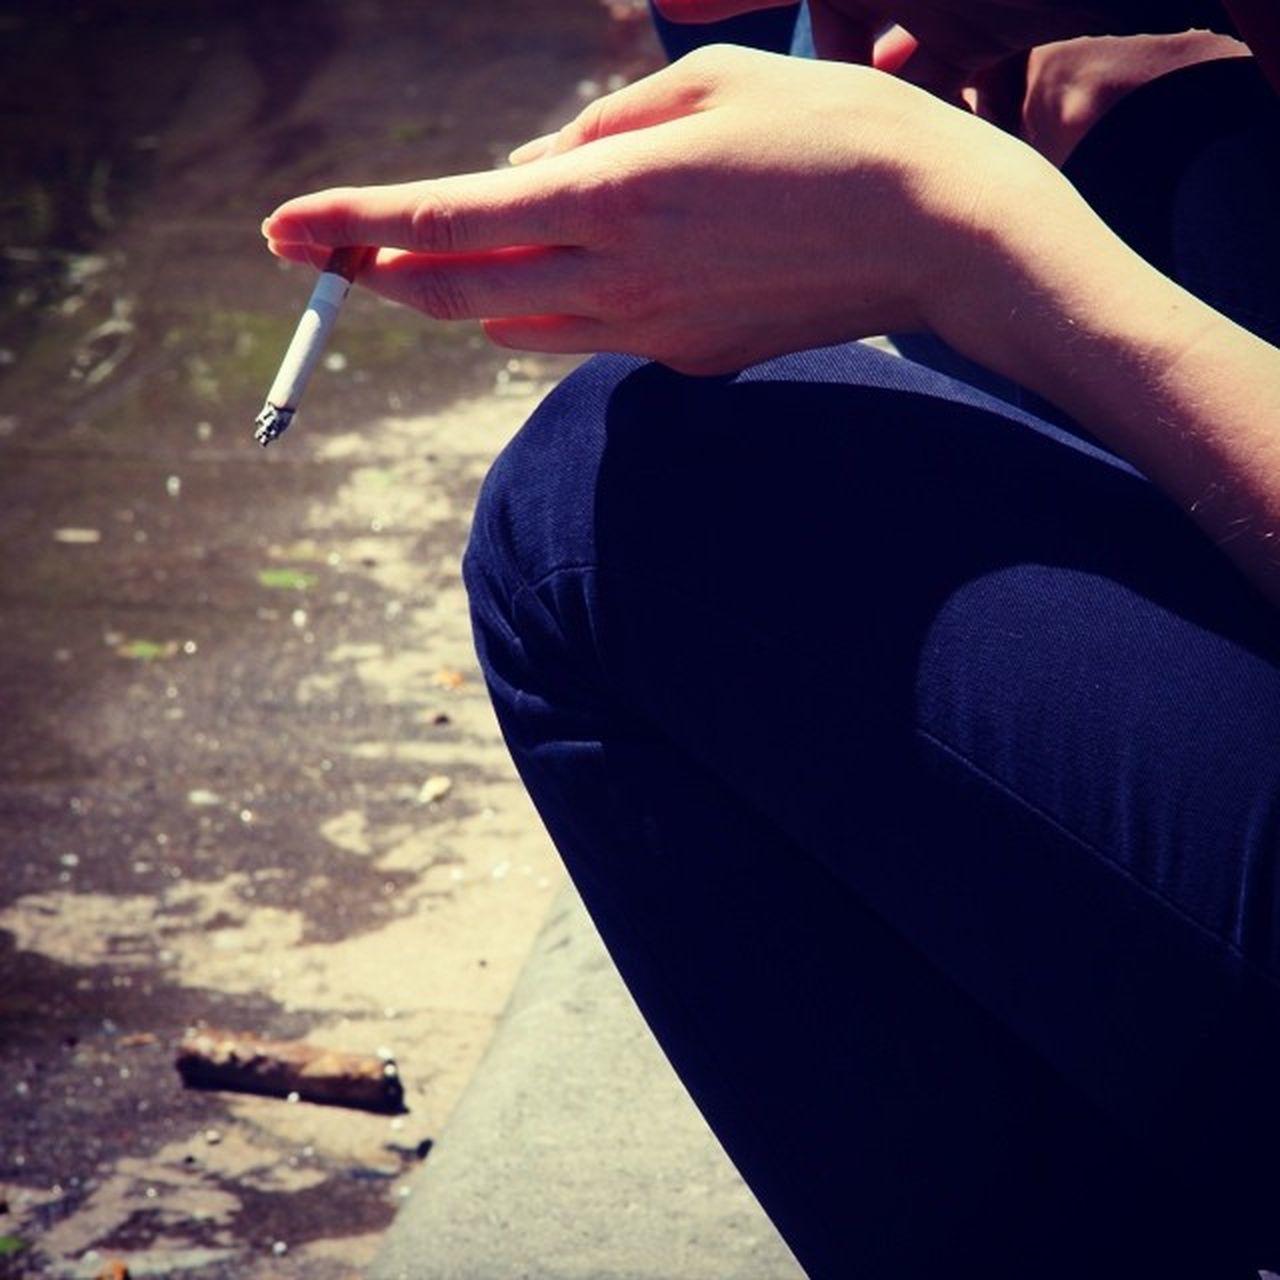 Human Hand Holding Cigarette